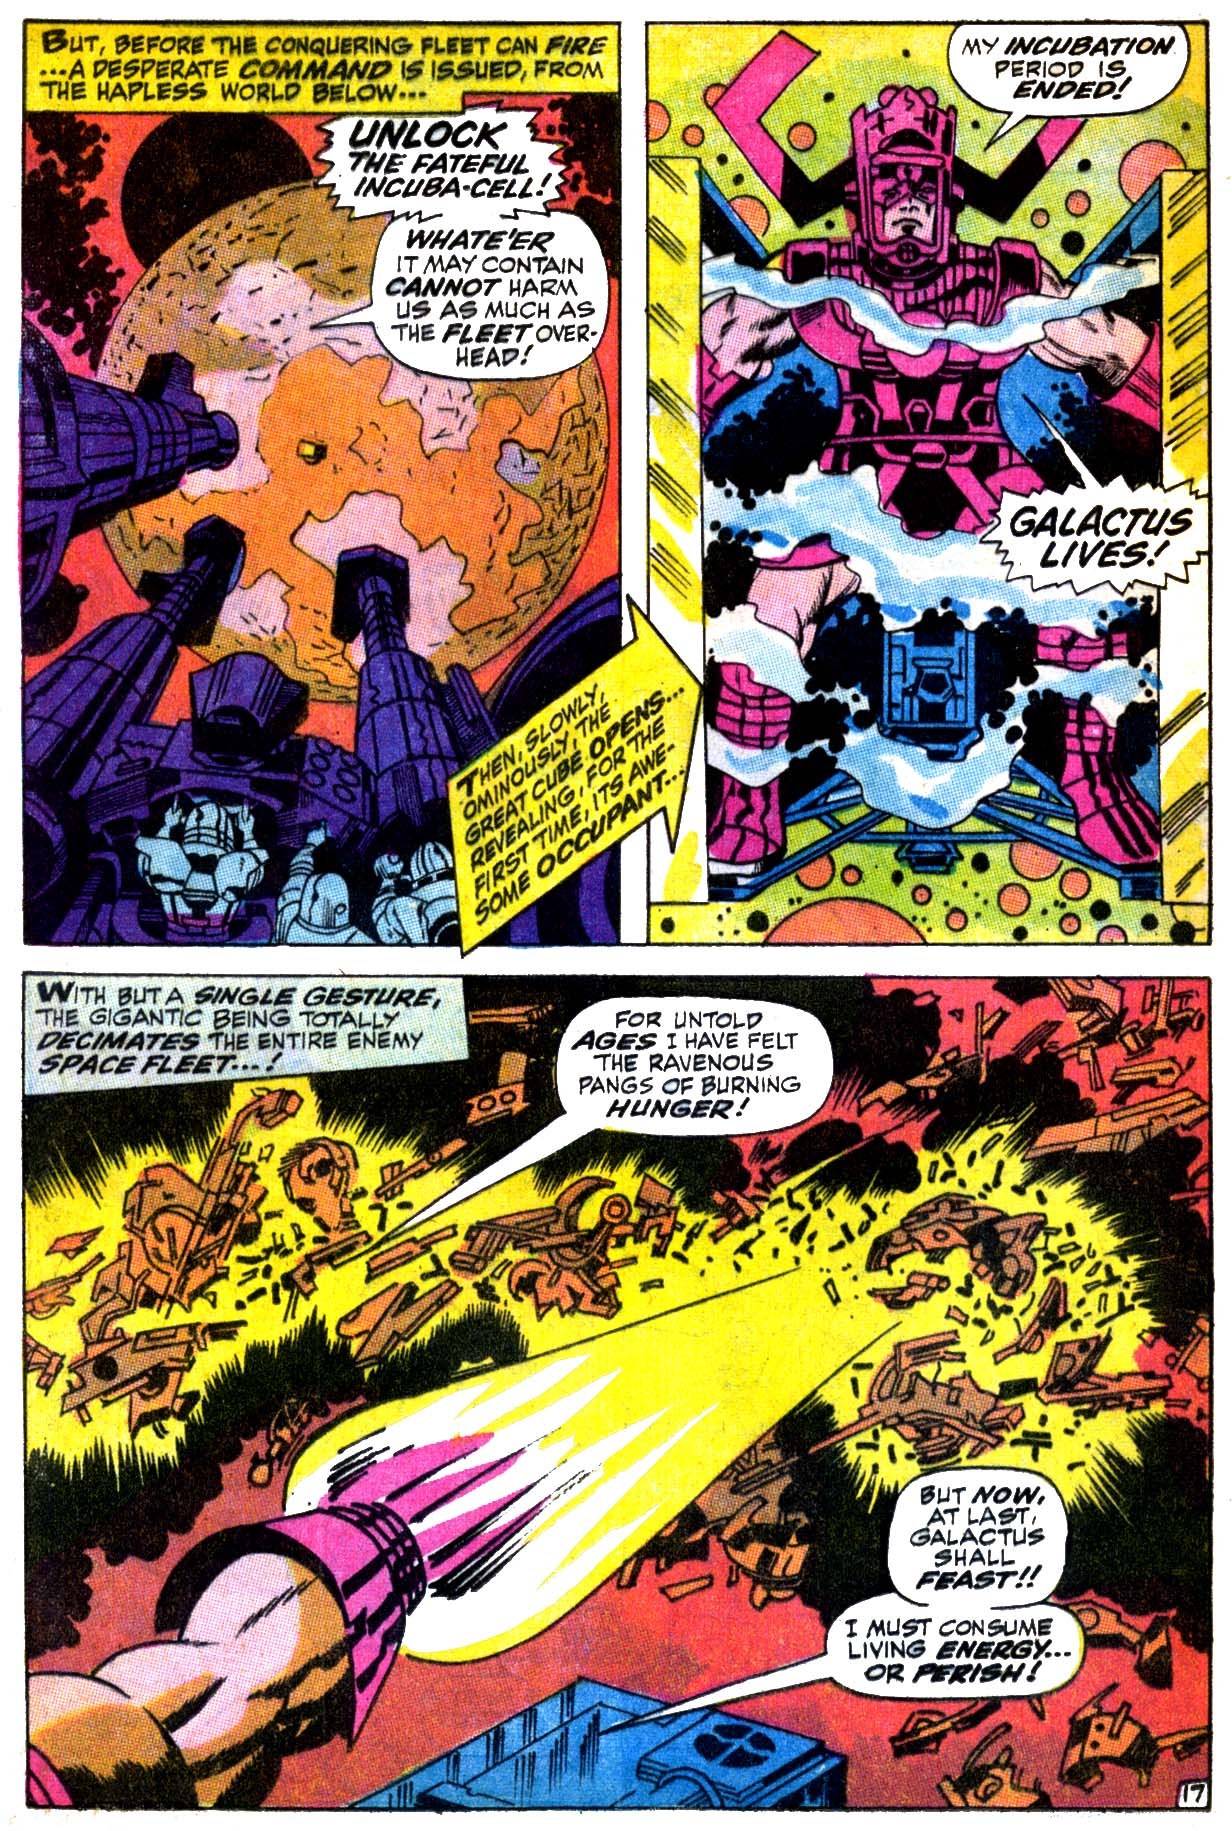 Thor 162-17